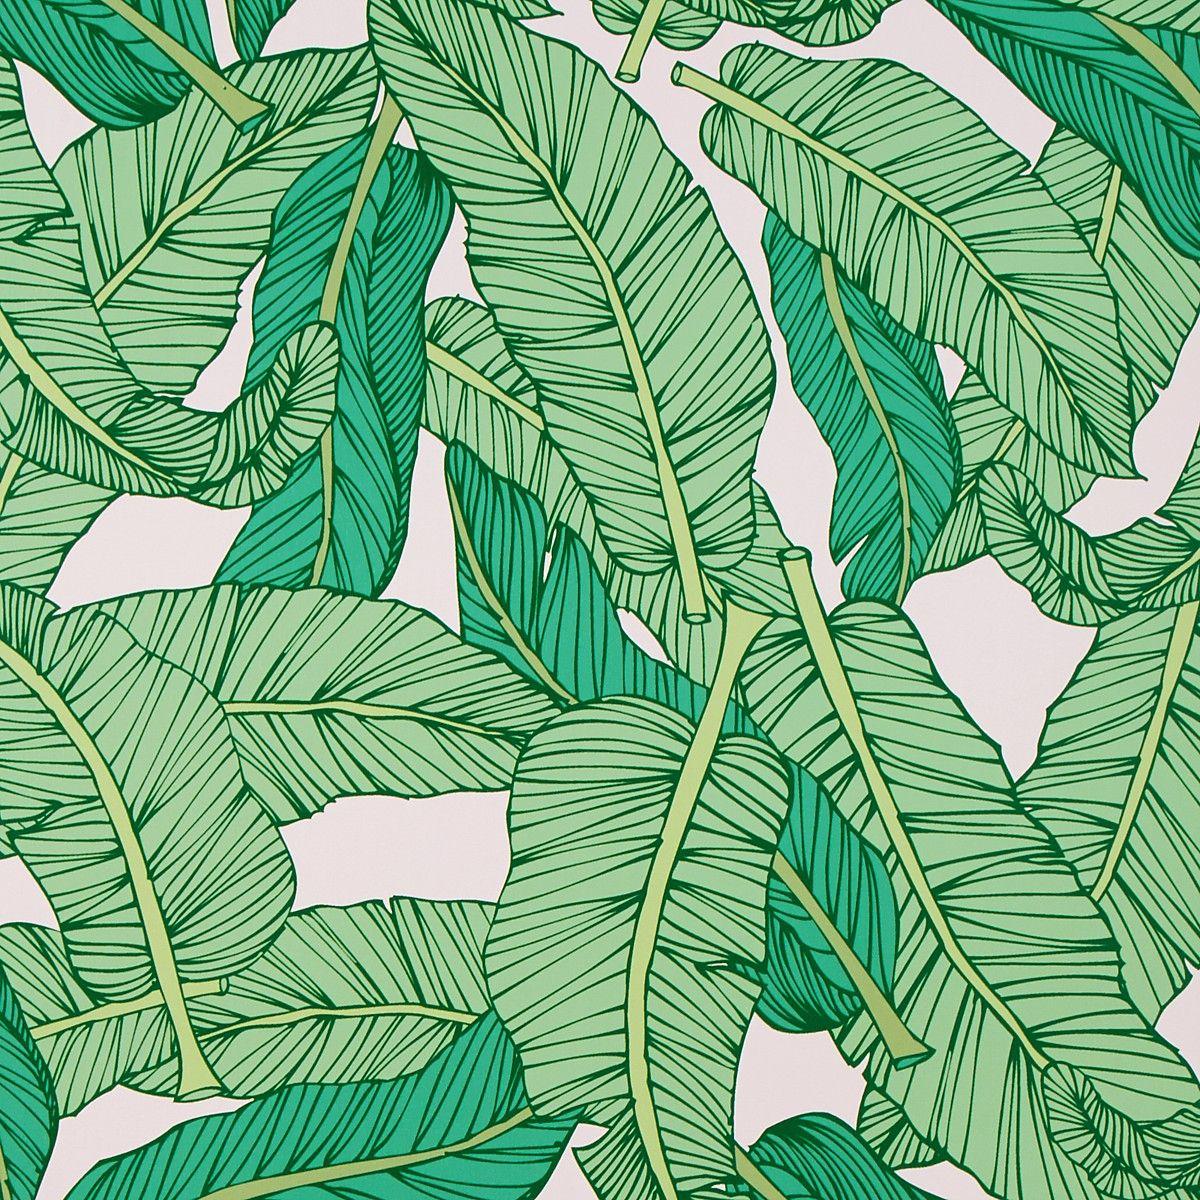 Banana Leaf Palm Tropical Wallpaper tropicalleaf